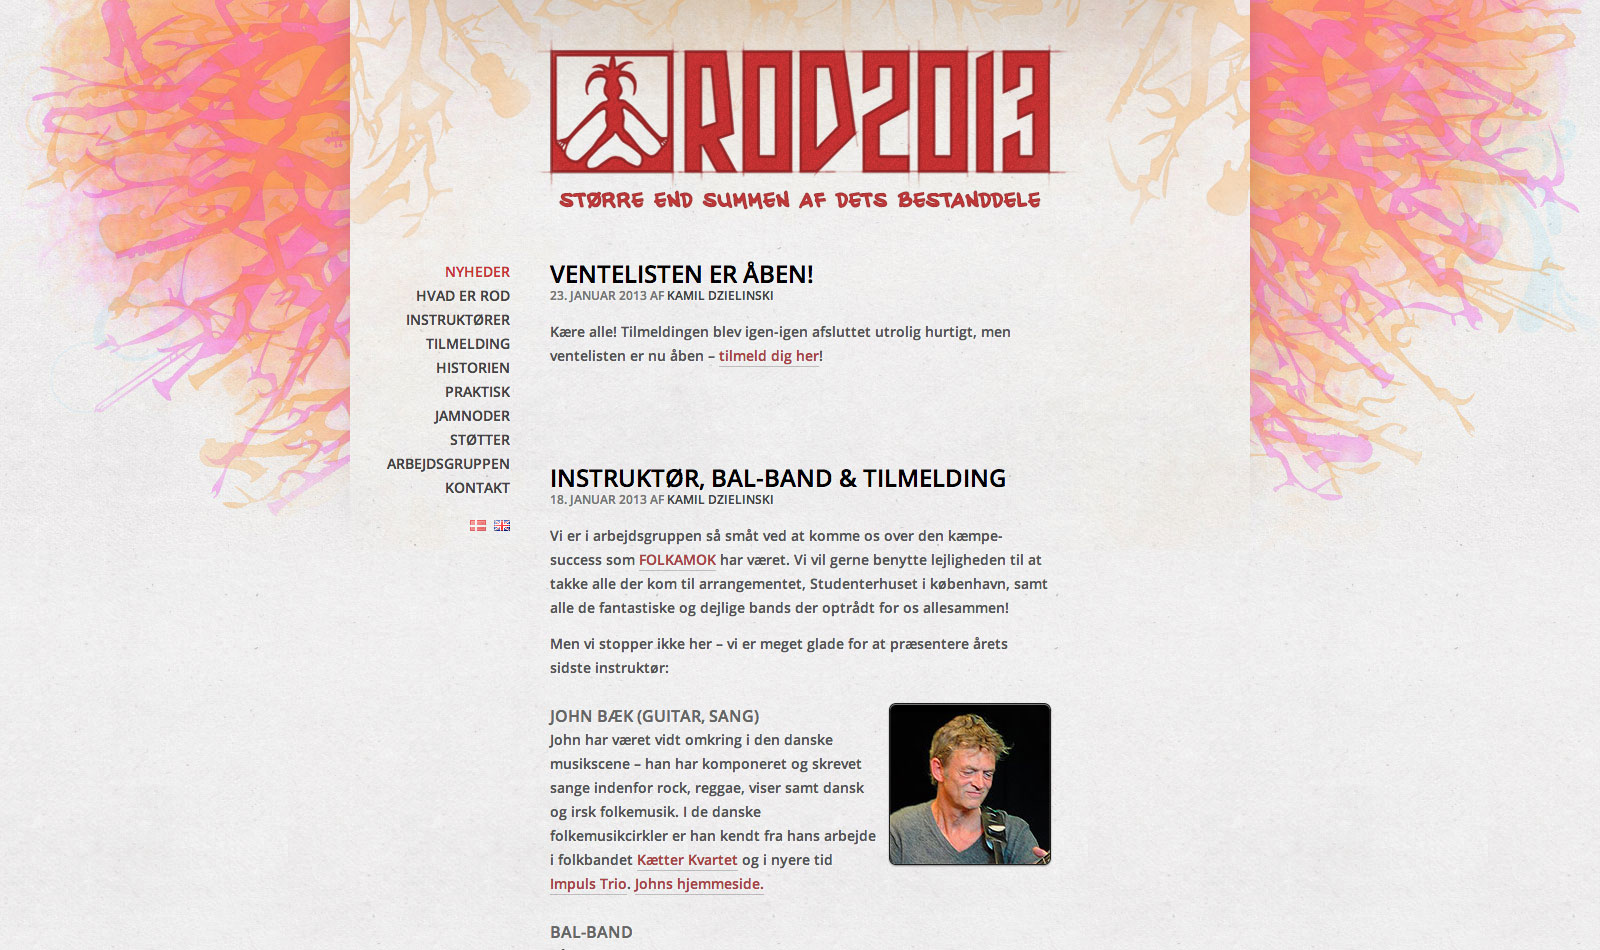 RODfolk.dk/2013 by brego